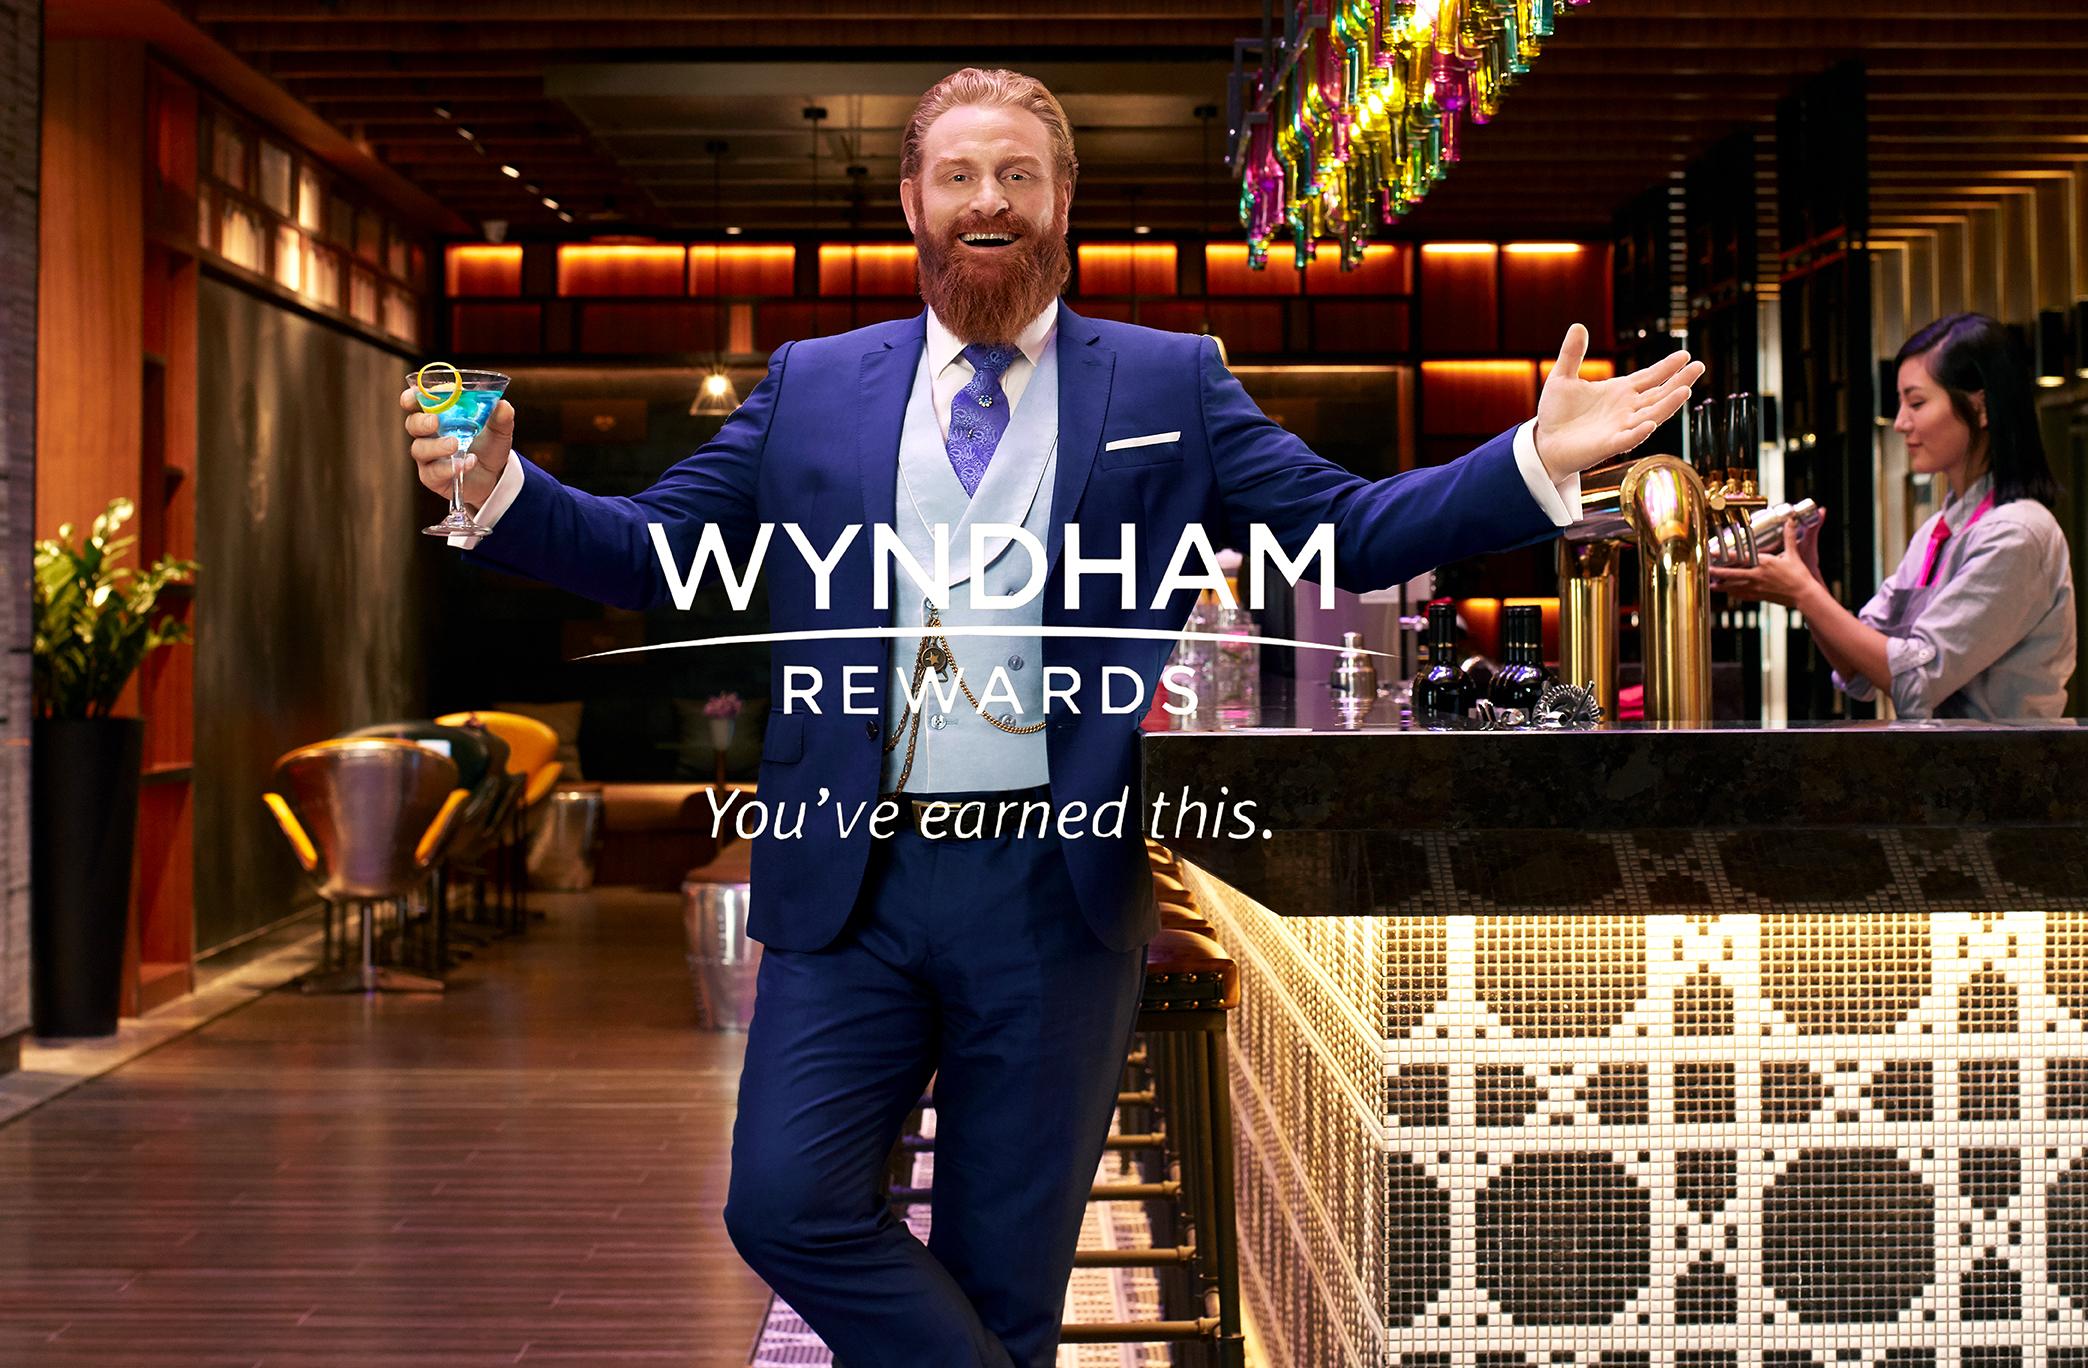 081117WY_wyndham_wyzard_xian_tryp_bar_058_09172017 copy.jpg